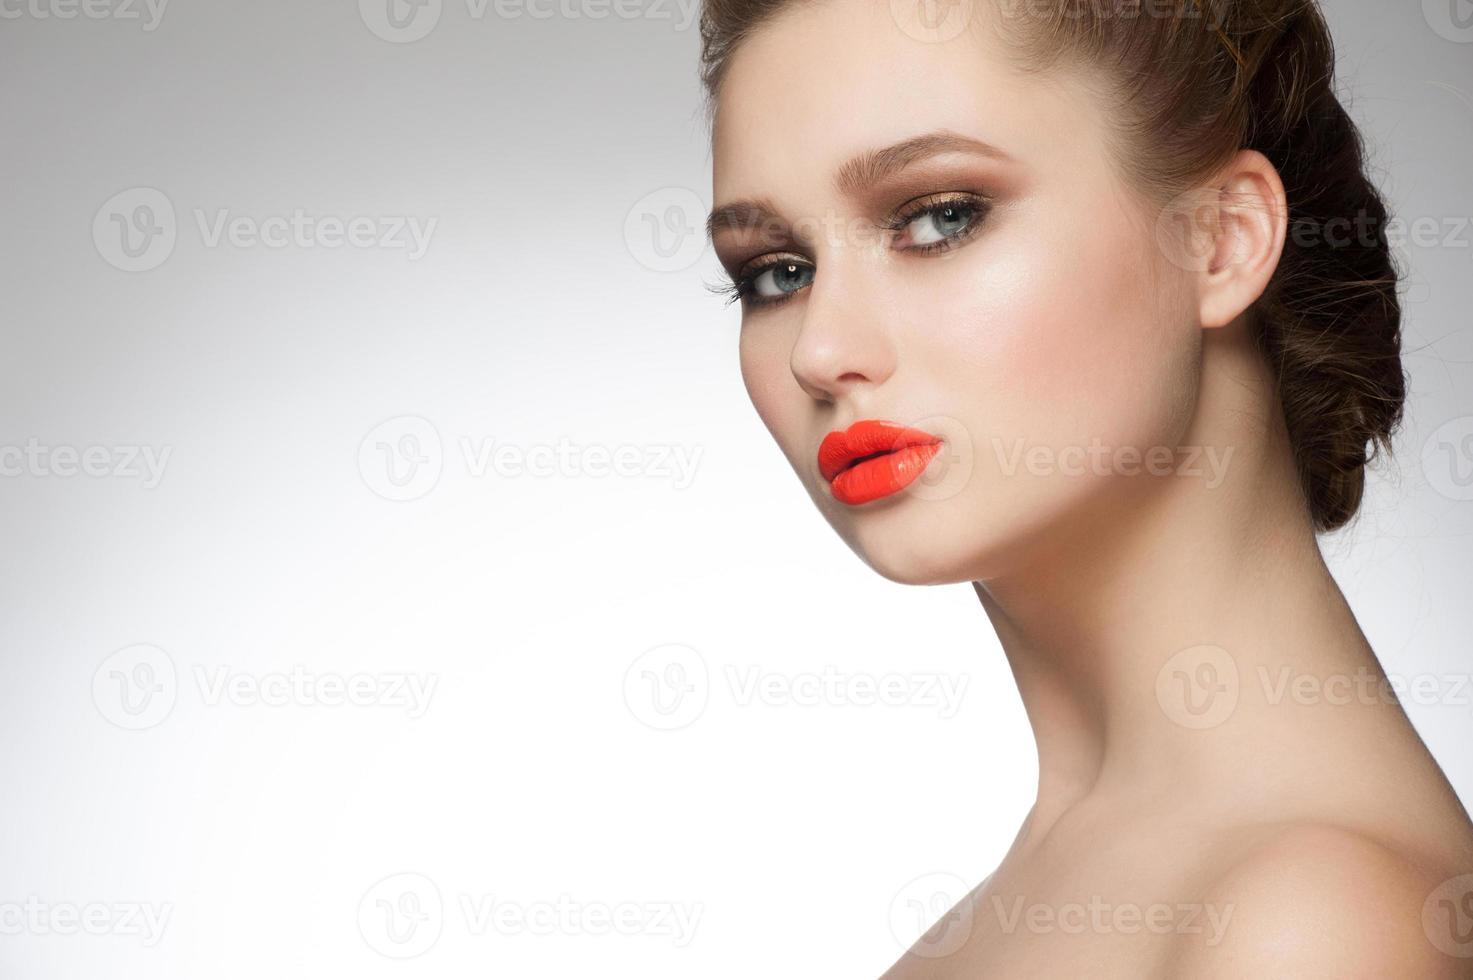 mujer con pintalabios naranja foto